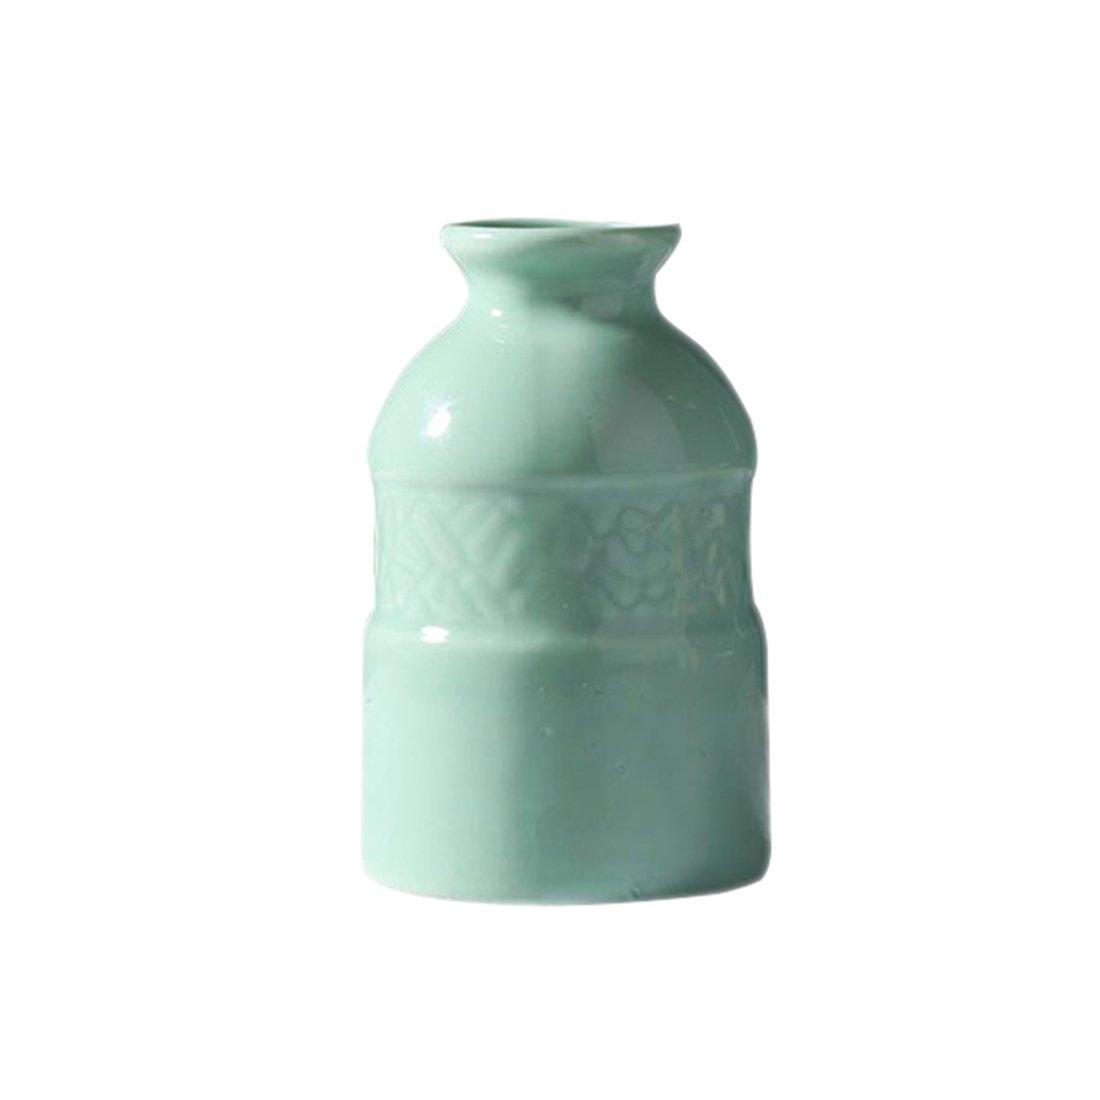 TOOGOO 3unids florero de Ceramica Creativa Oficina Escritorio Decoracion Flores Manualidades Simples Ceramica aromaterapia Botella (Azul, Rosa, ...